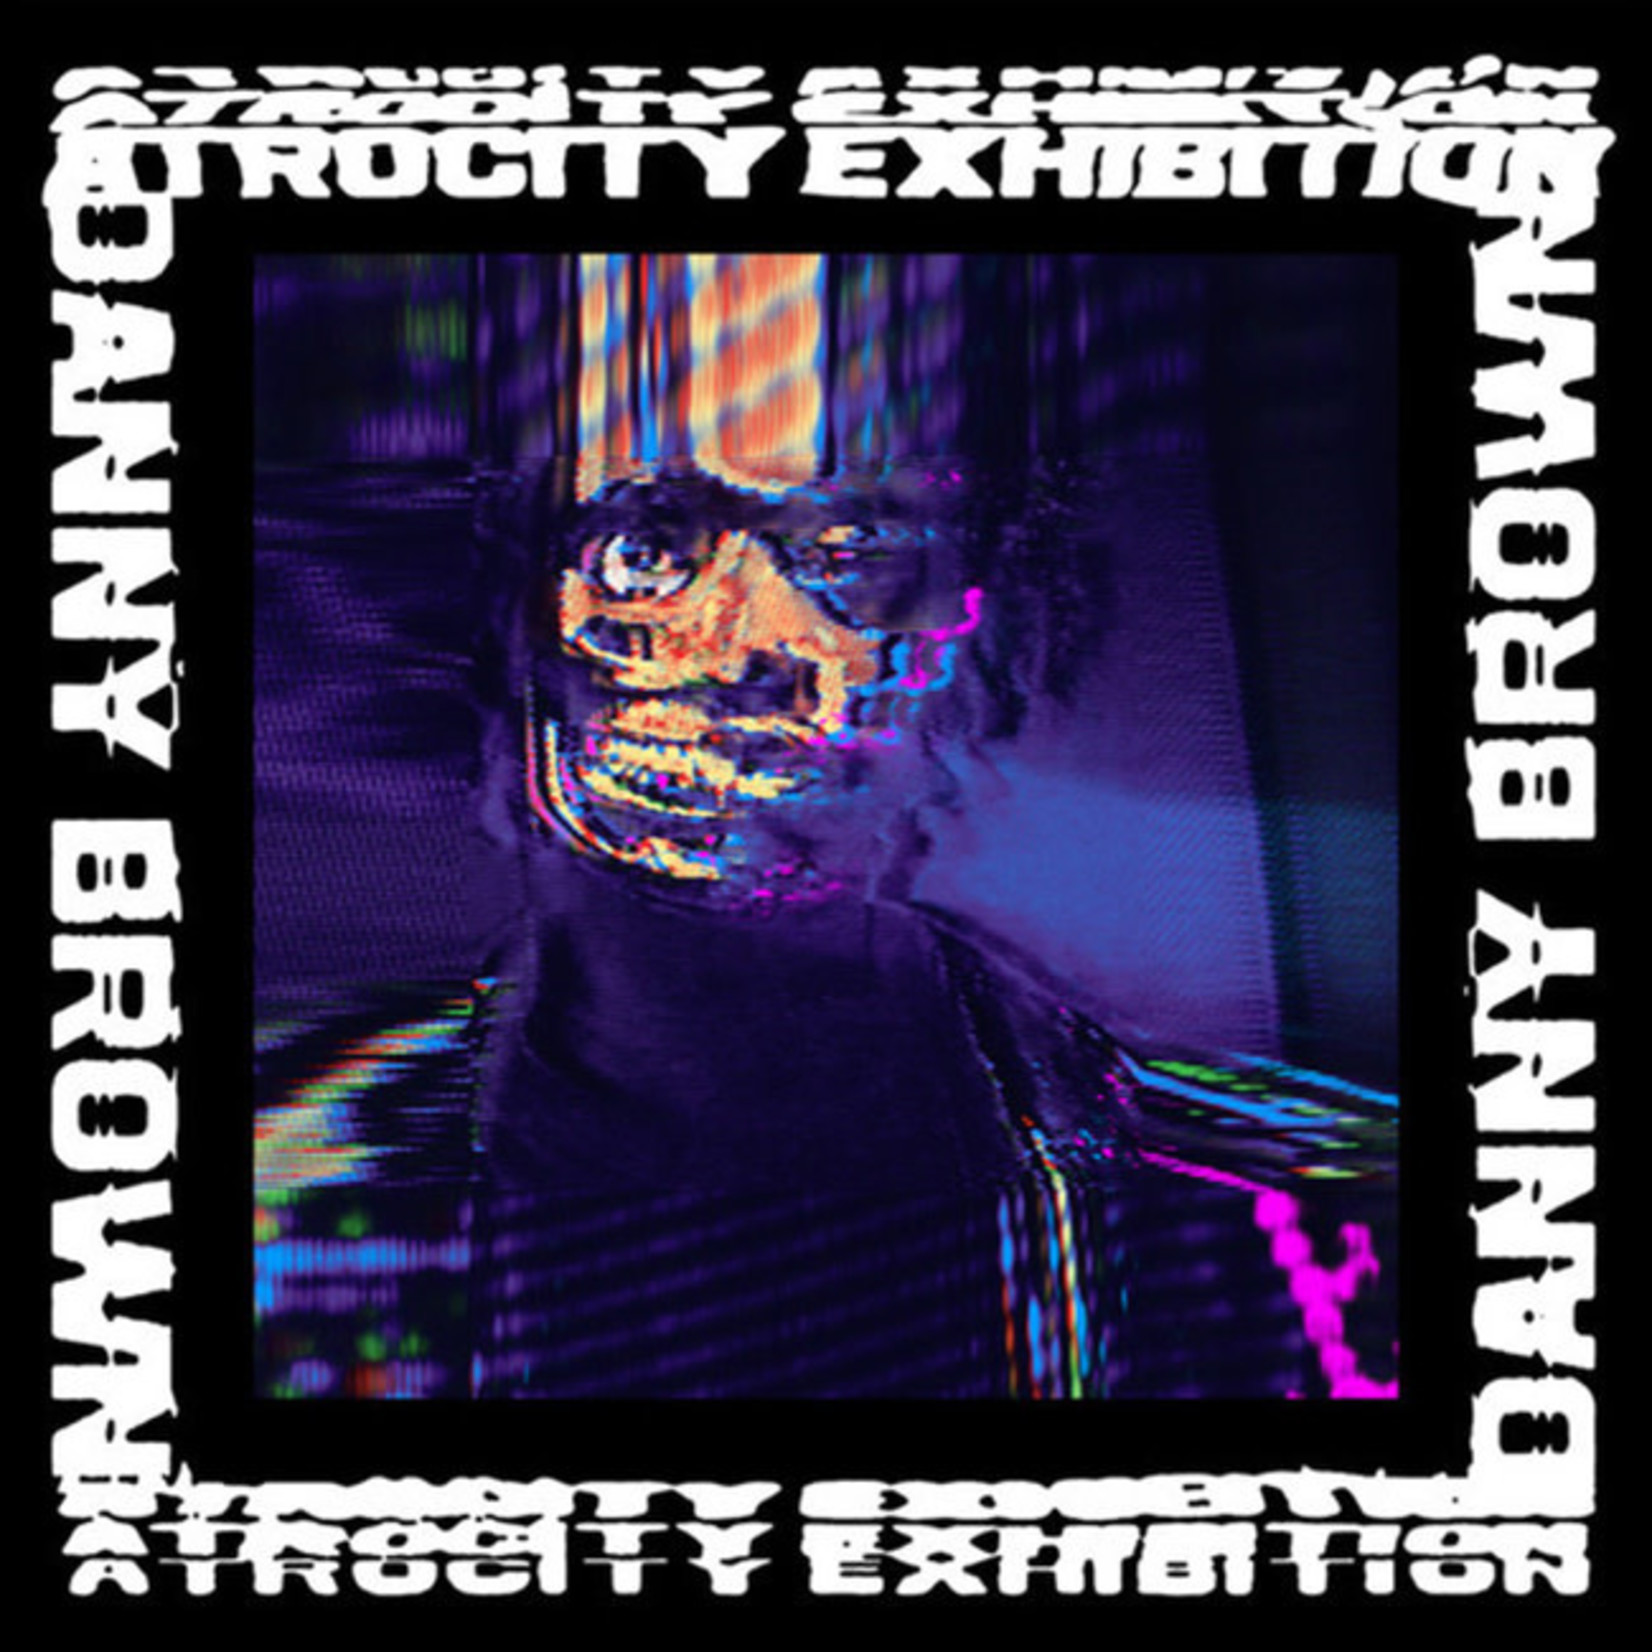 [New] Brown, Danny: Atrocity Exhibition (2LP)